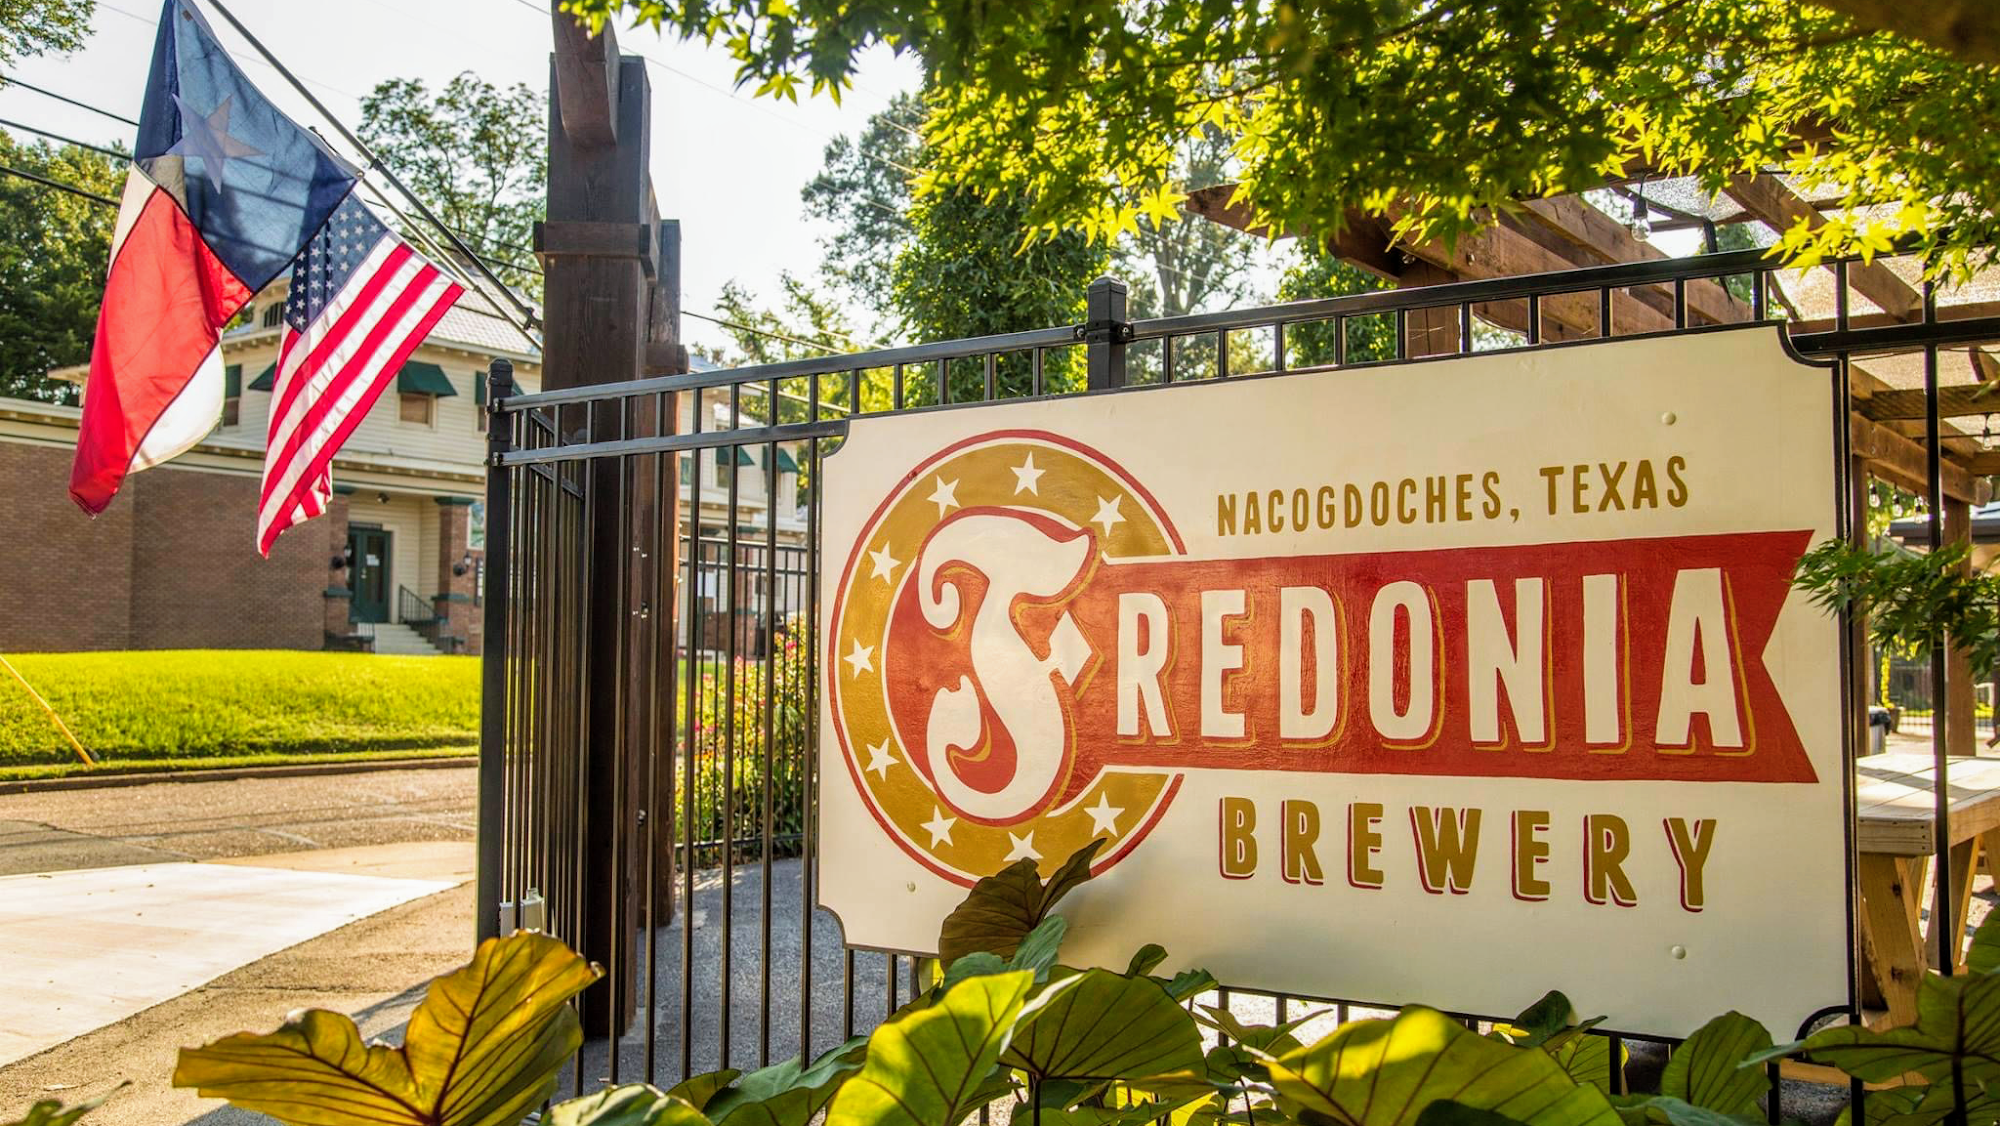 Fredonia Brewery, LLC 138 N Mound St, Nacogdoches